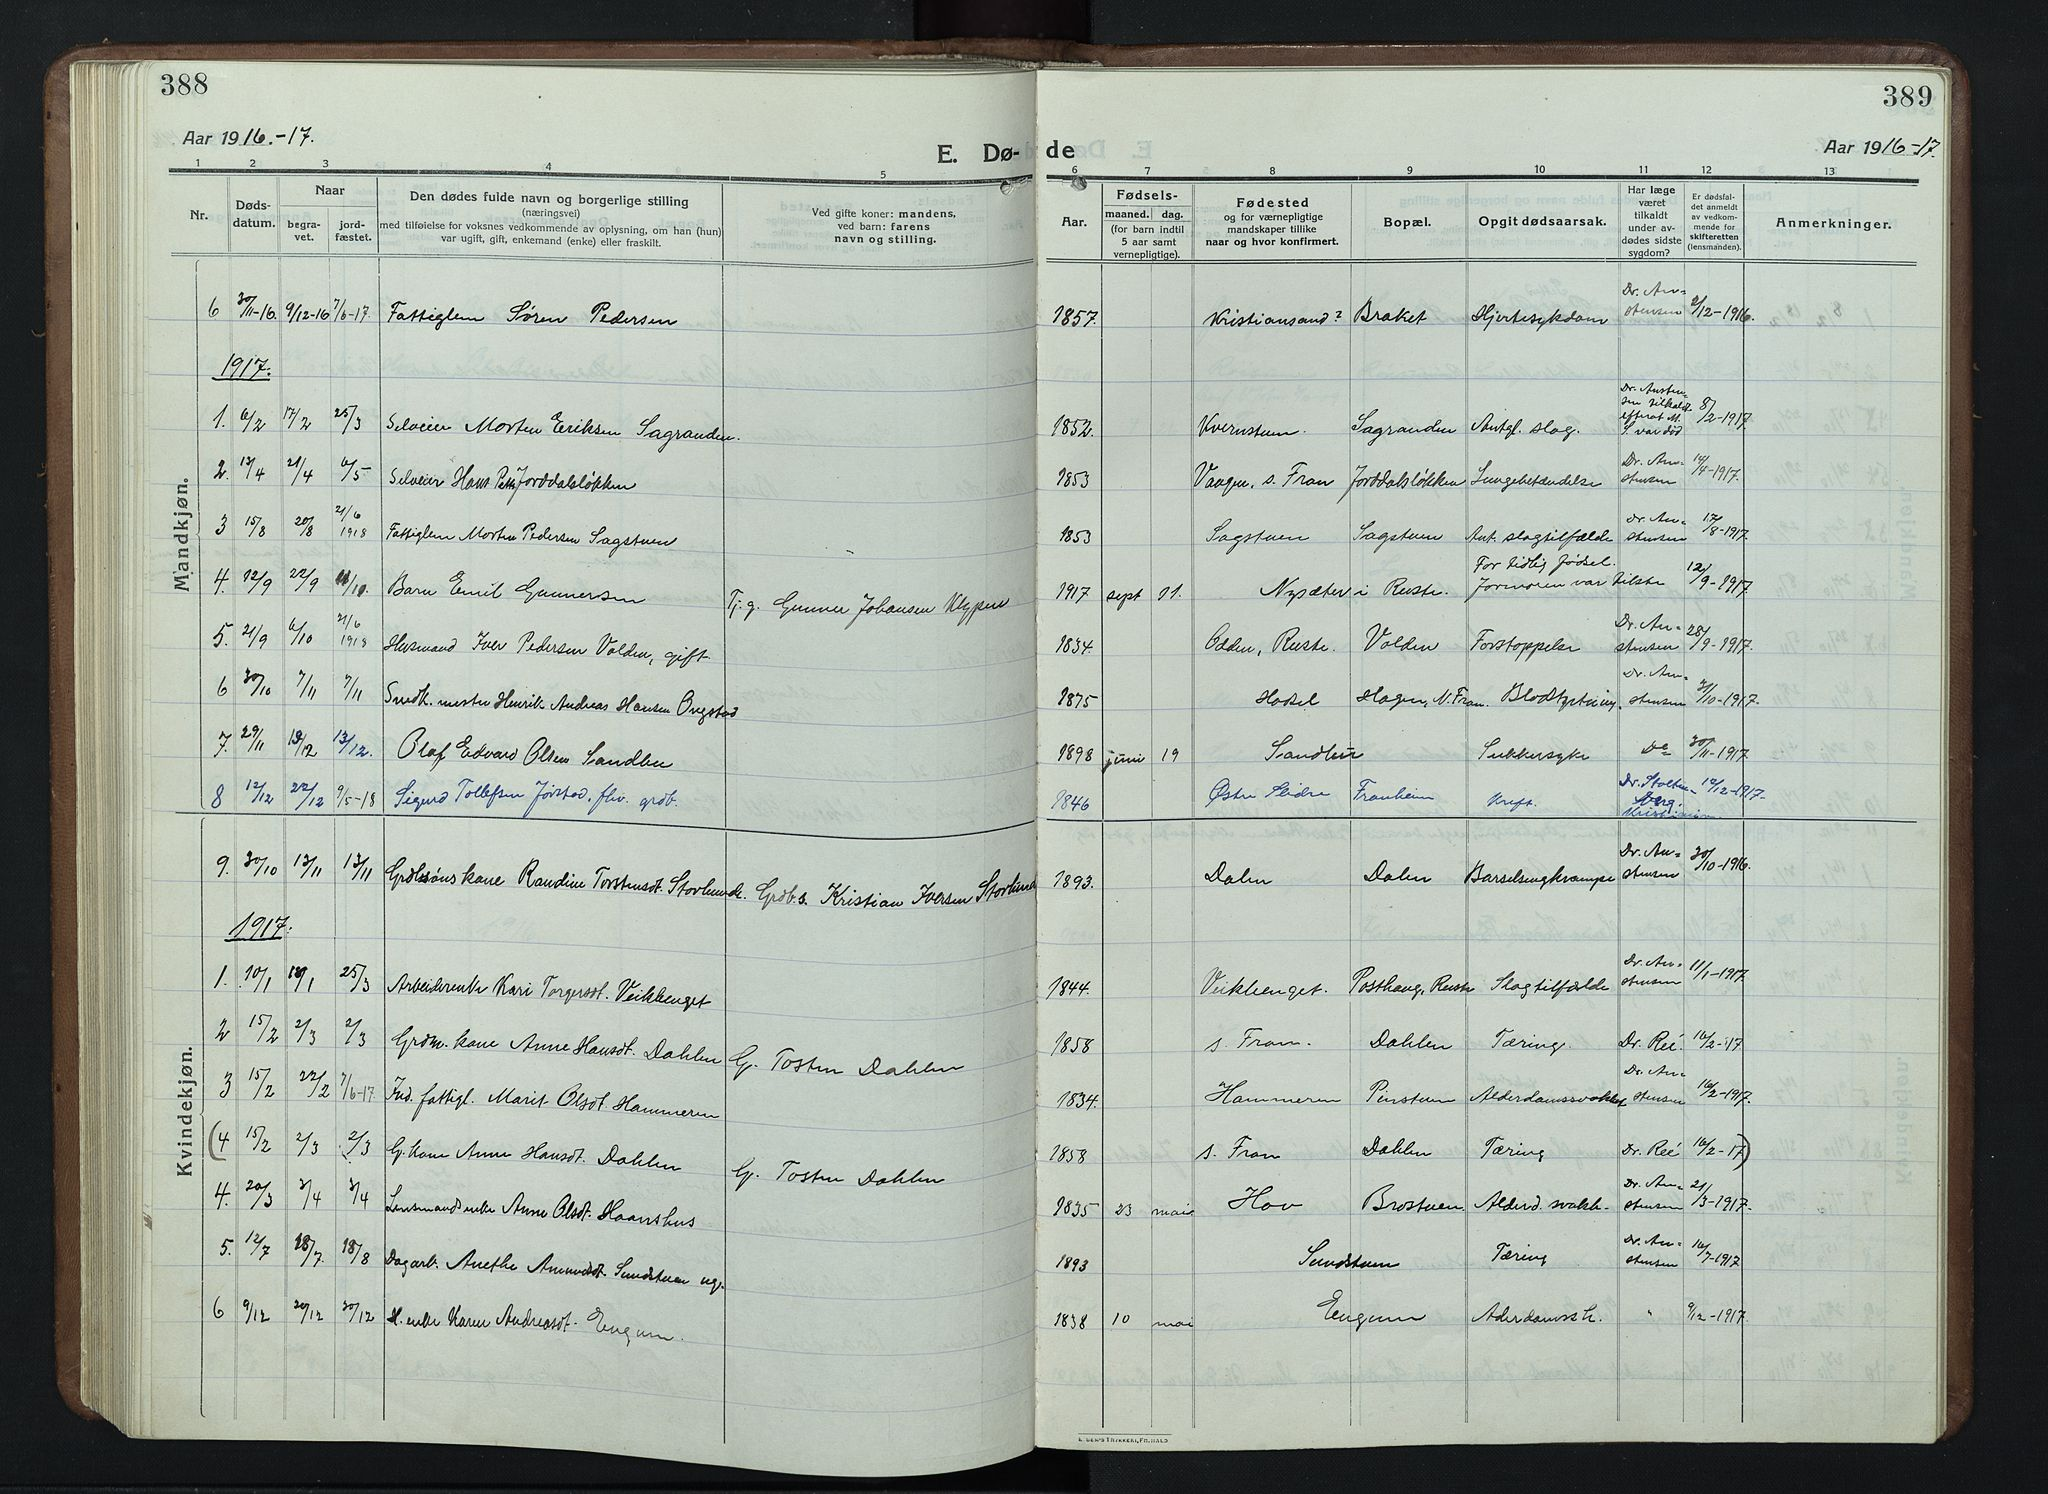 SAH, Nord-Fron prestekontor, Klokkerbok nr. 7, 1915-1946, s. 388-389